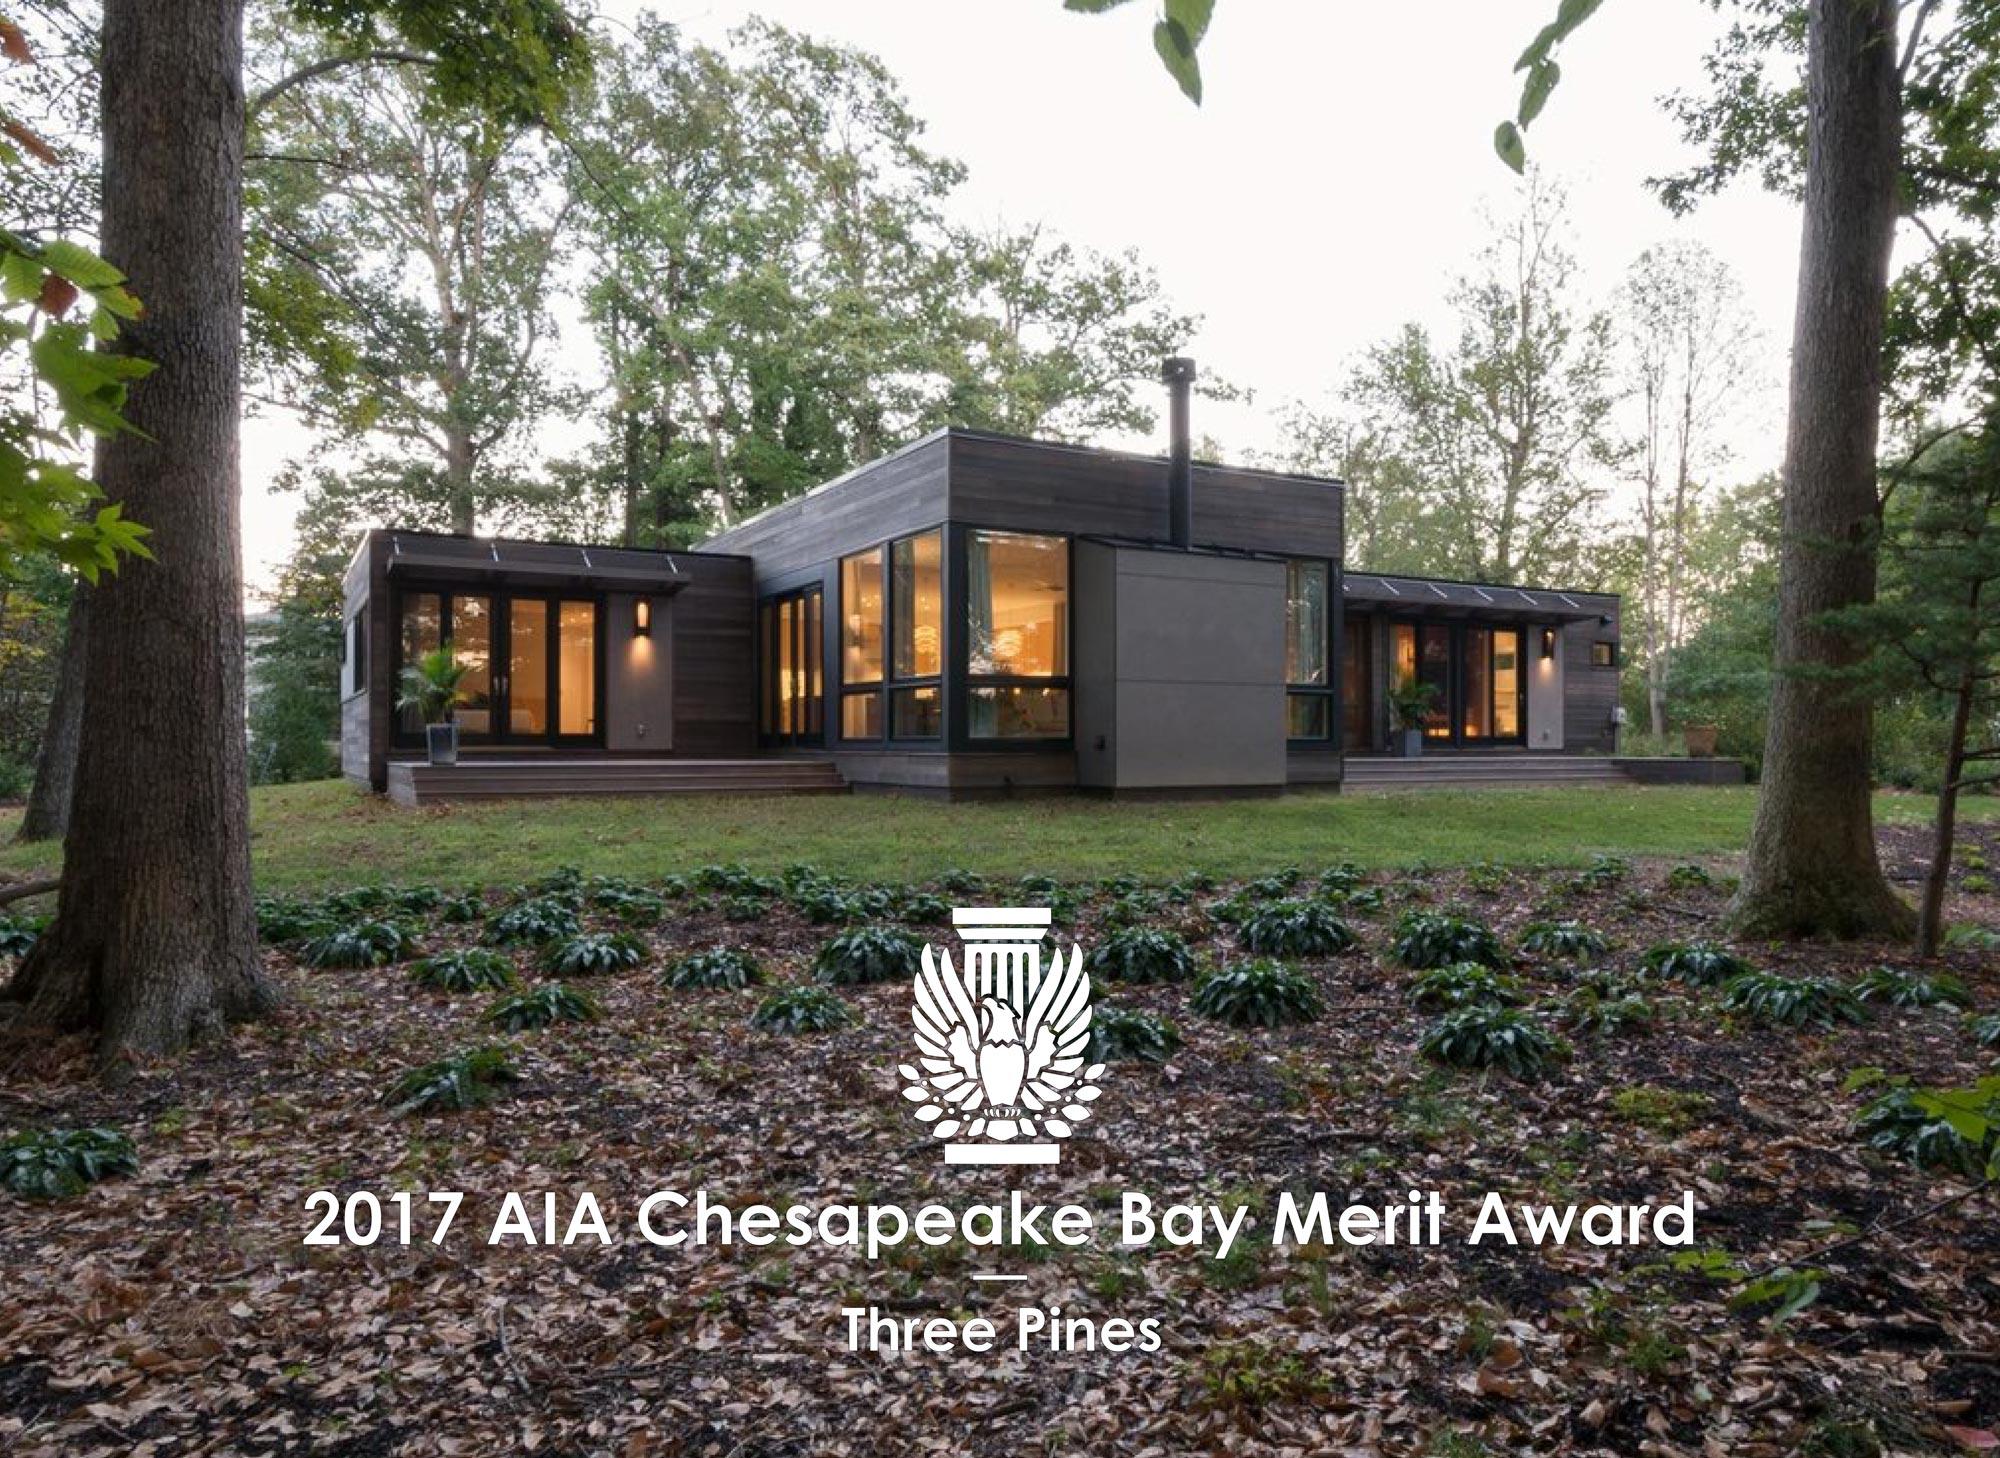 res4-resolution-4-architecture-modern-modular-home-prefab-three-pines-aia-chesapeake-bay-merit-award-logo2-01.jpg